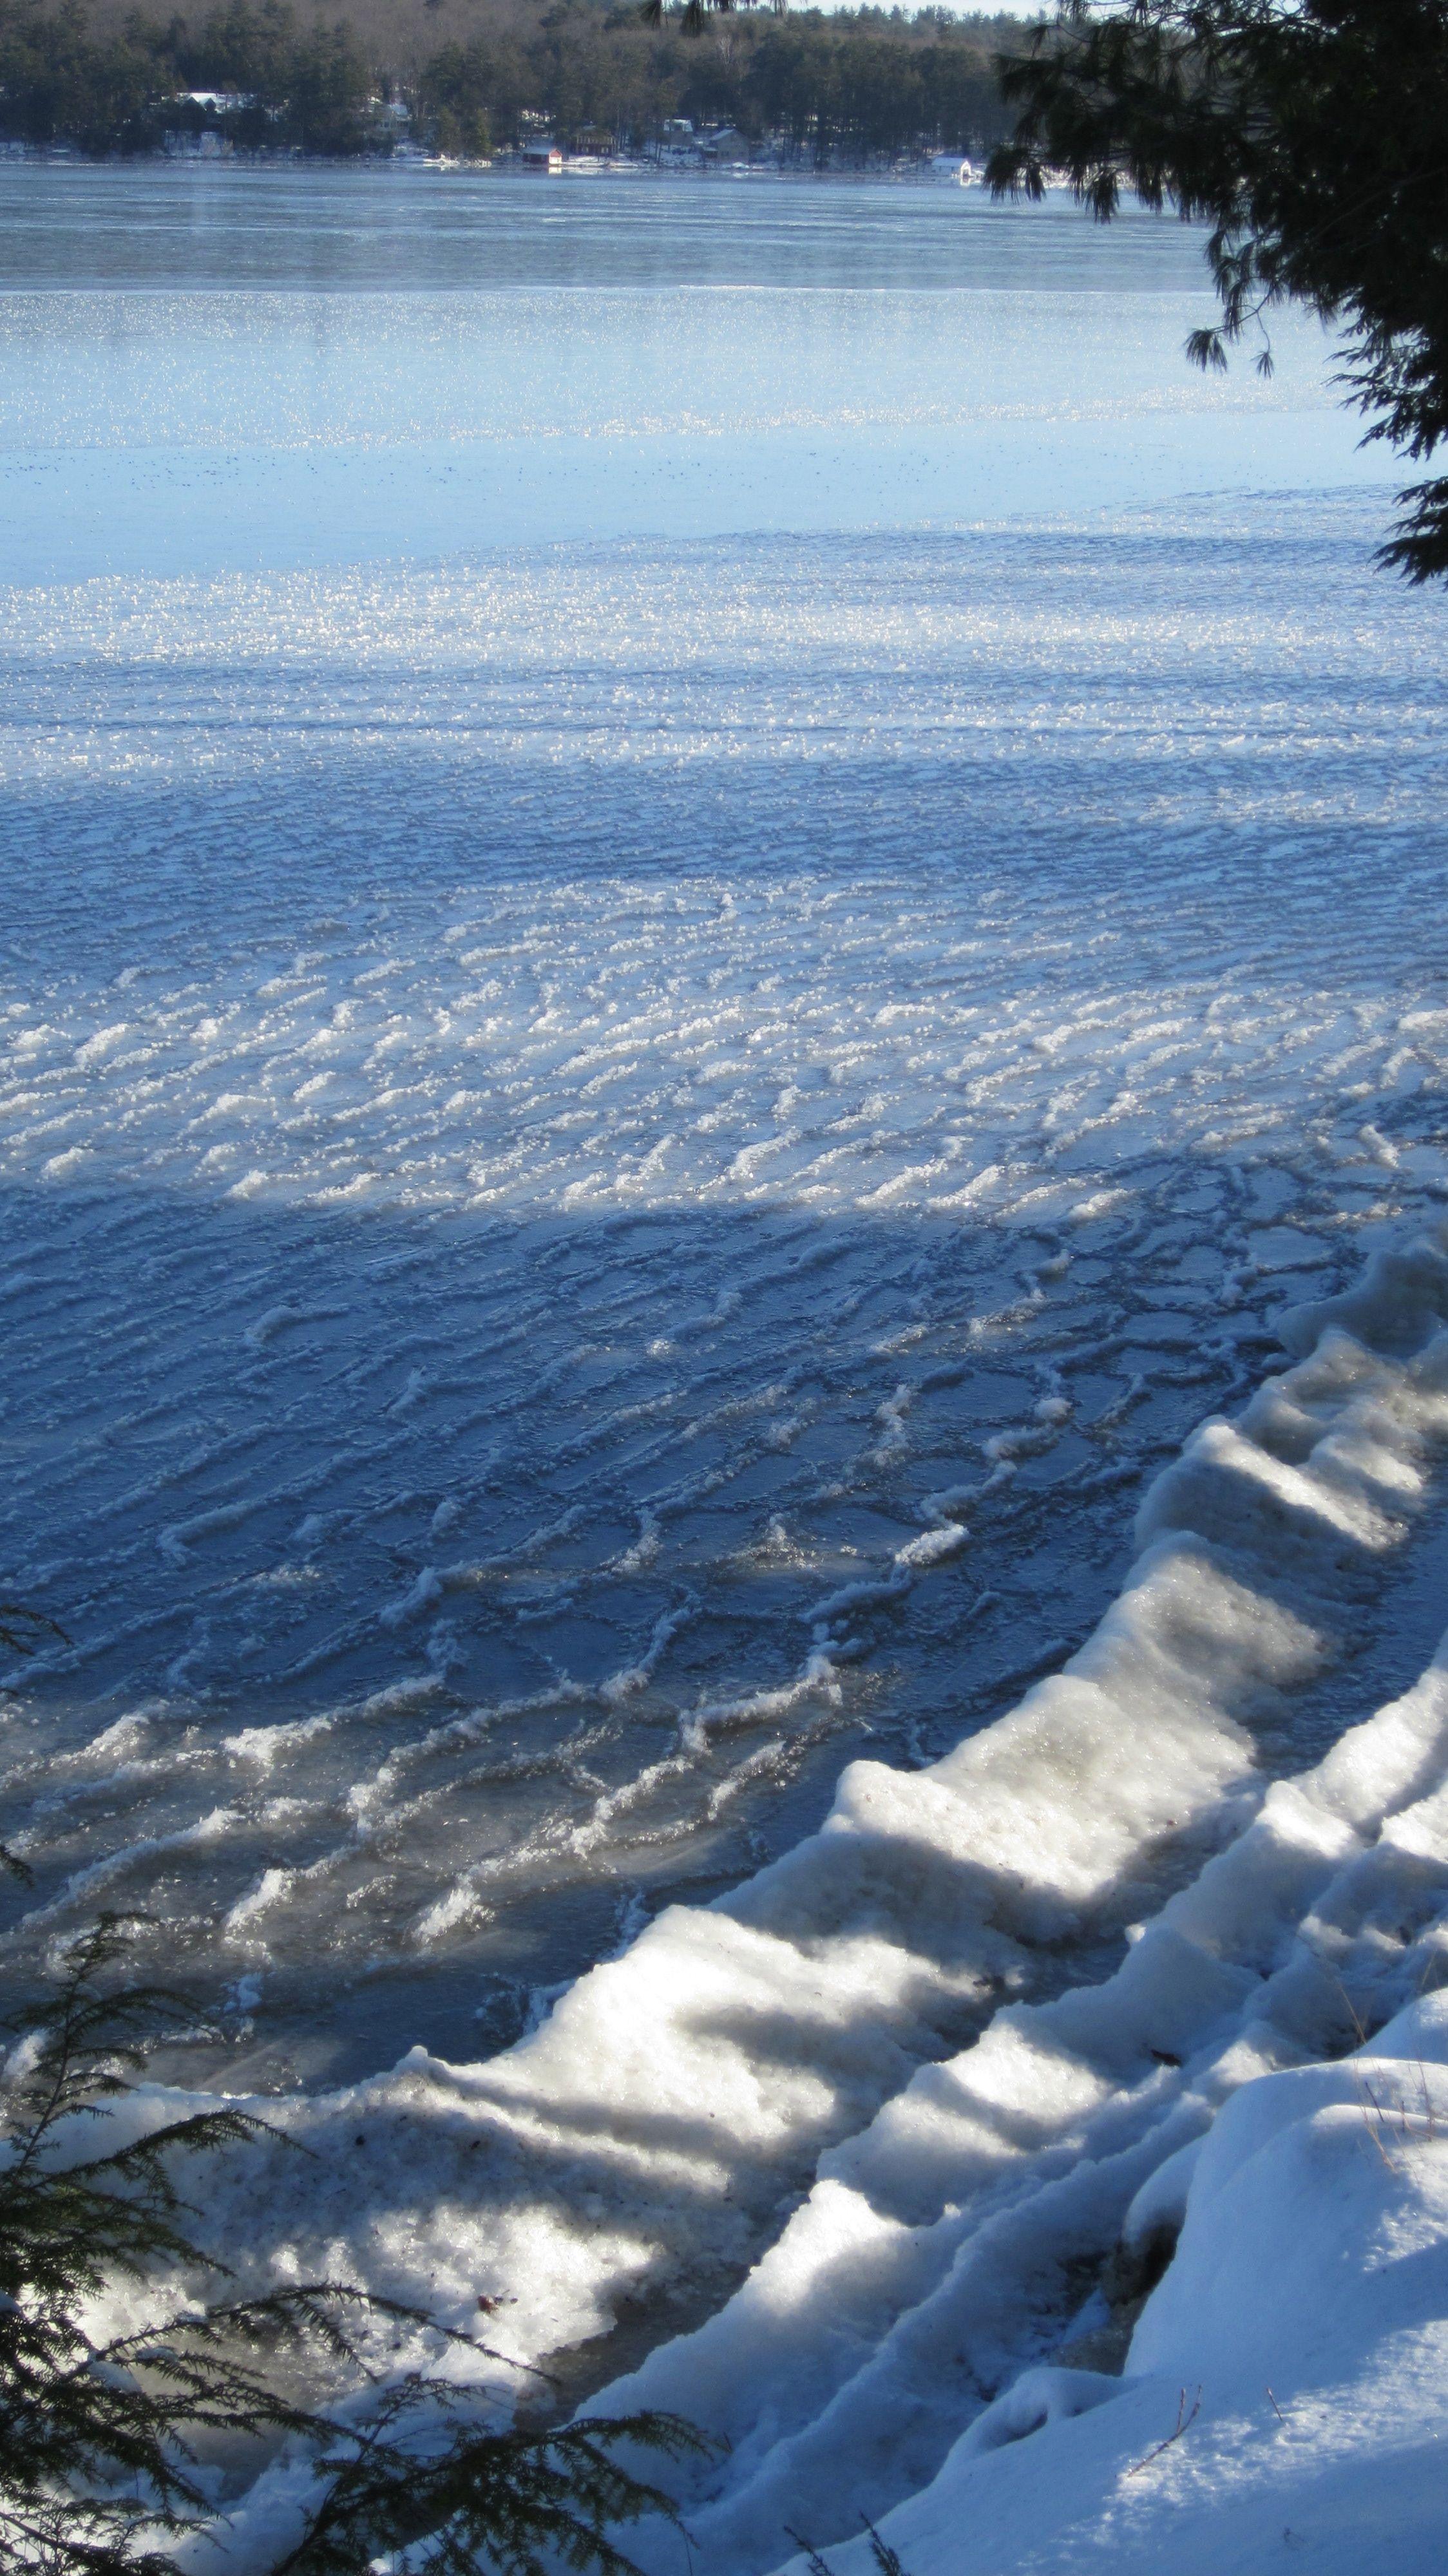 Frozen Waves on Winnisquam January 16, 2012